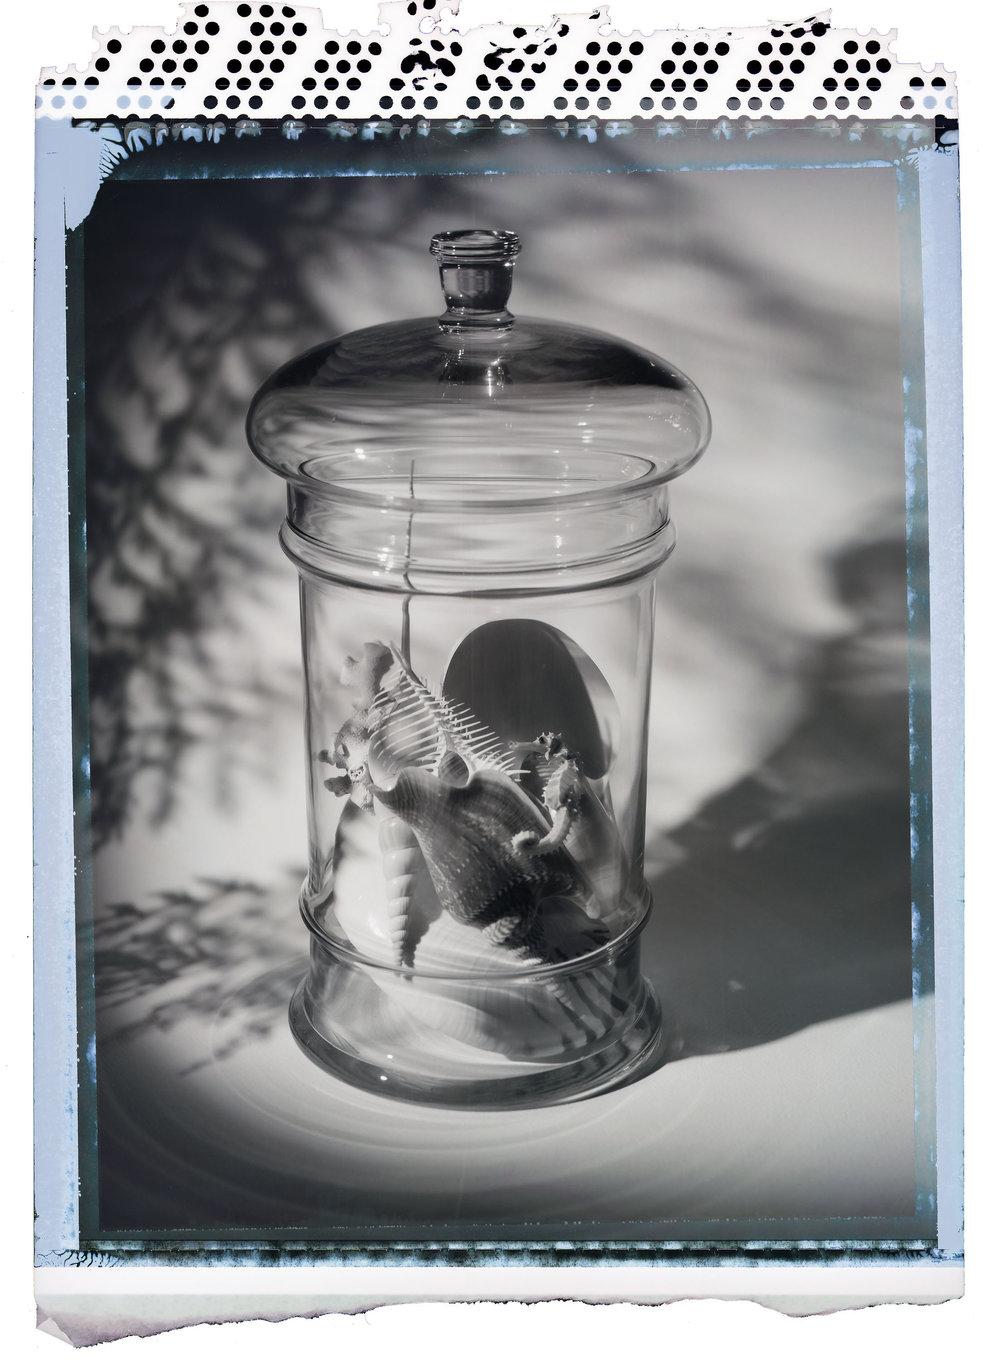 Polaroid_PN55_036.jpg